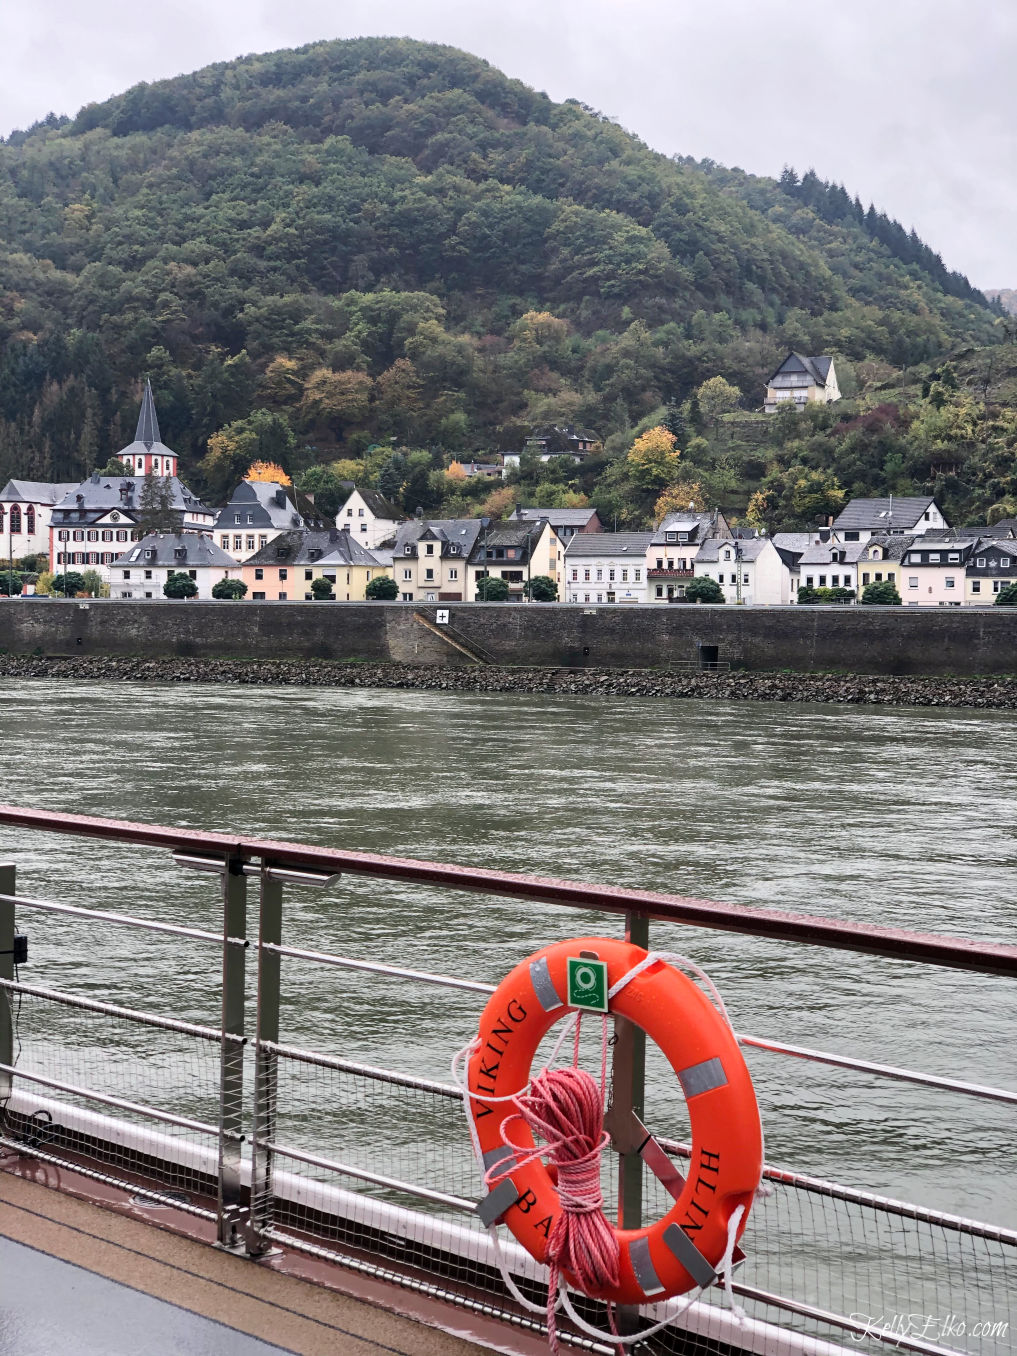 Viking River Cruise along the Rhine River kellyelko.com #rivercruise #vikingrivercruise #myvikingjourney #vikinghlin #rhineriver #vacation #europevacation #travel #travelblog #travelblogger